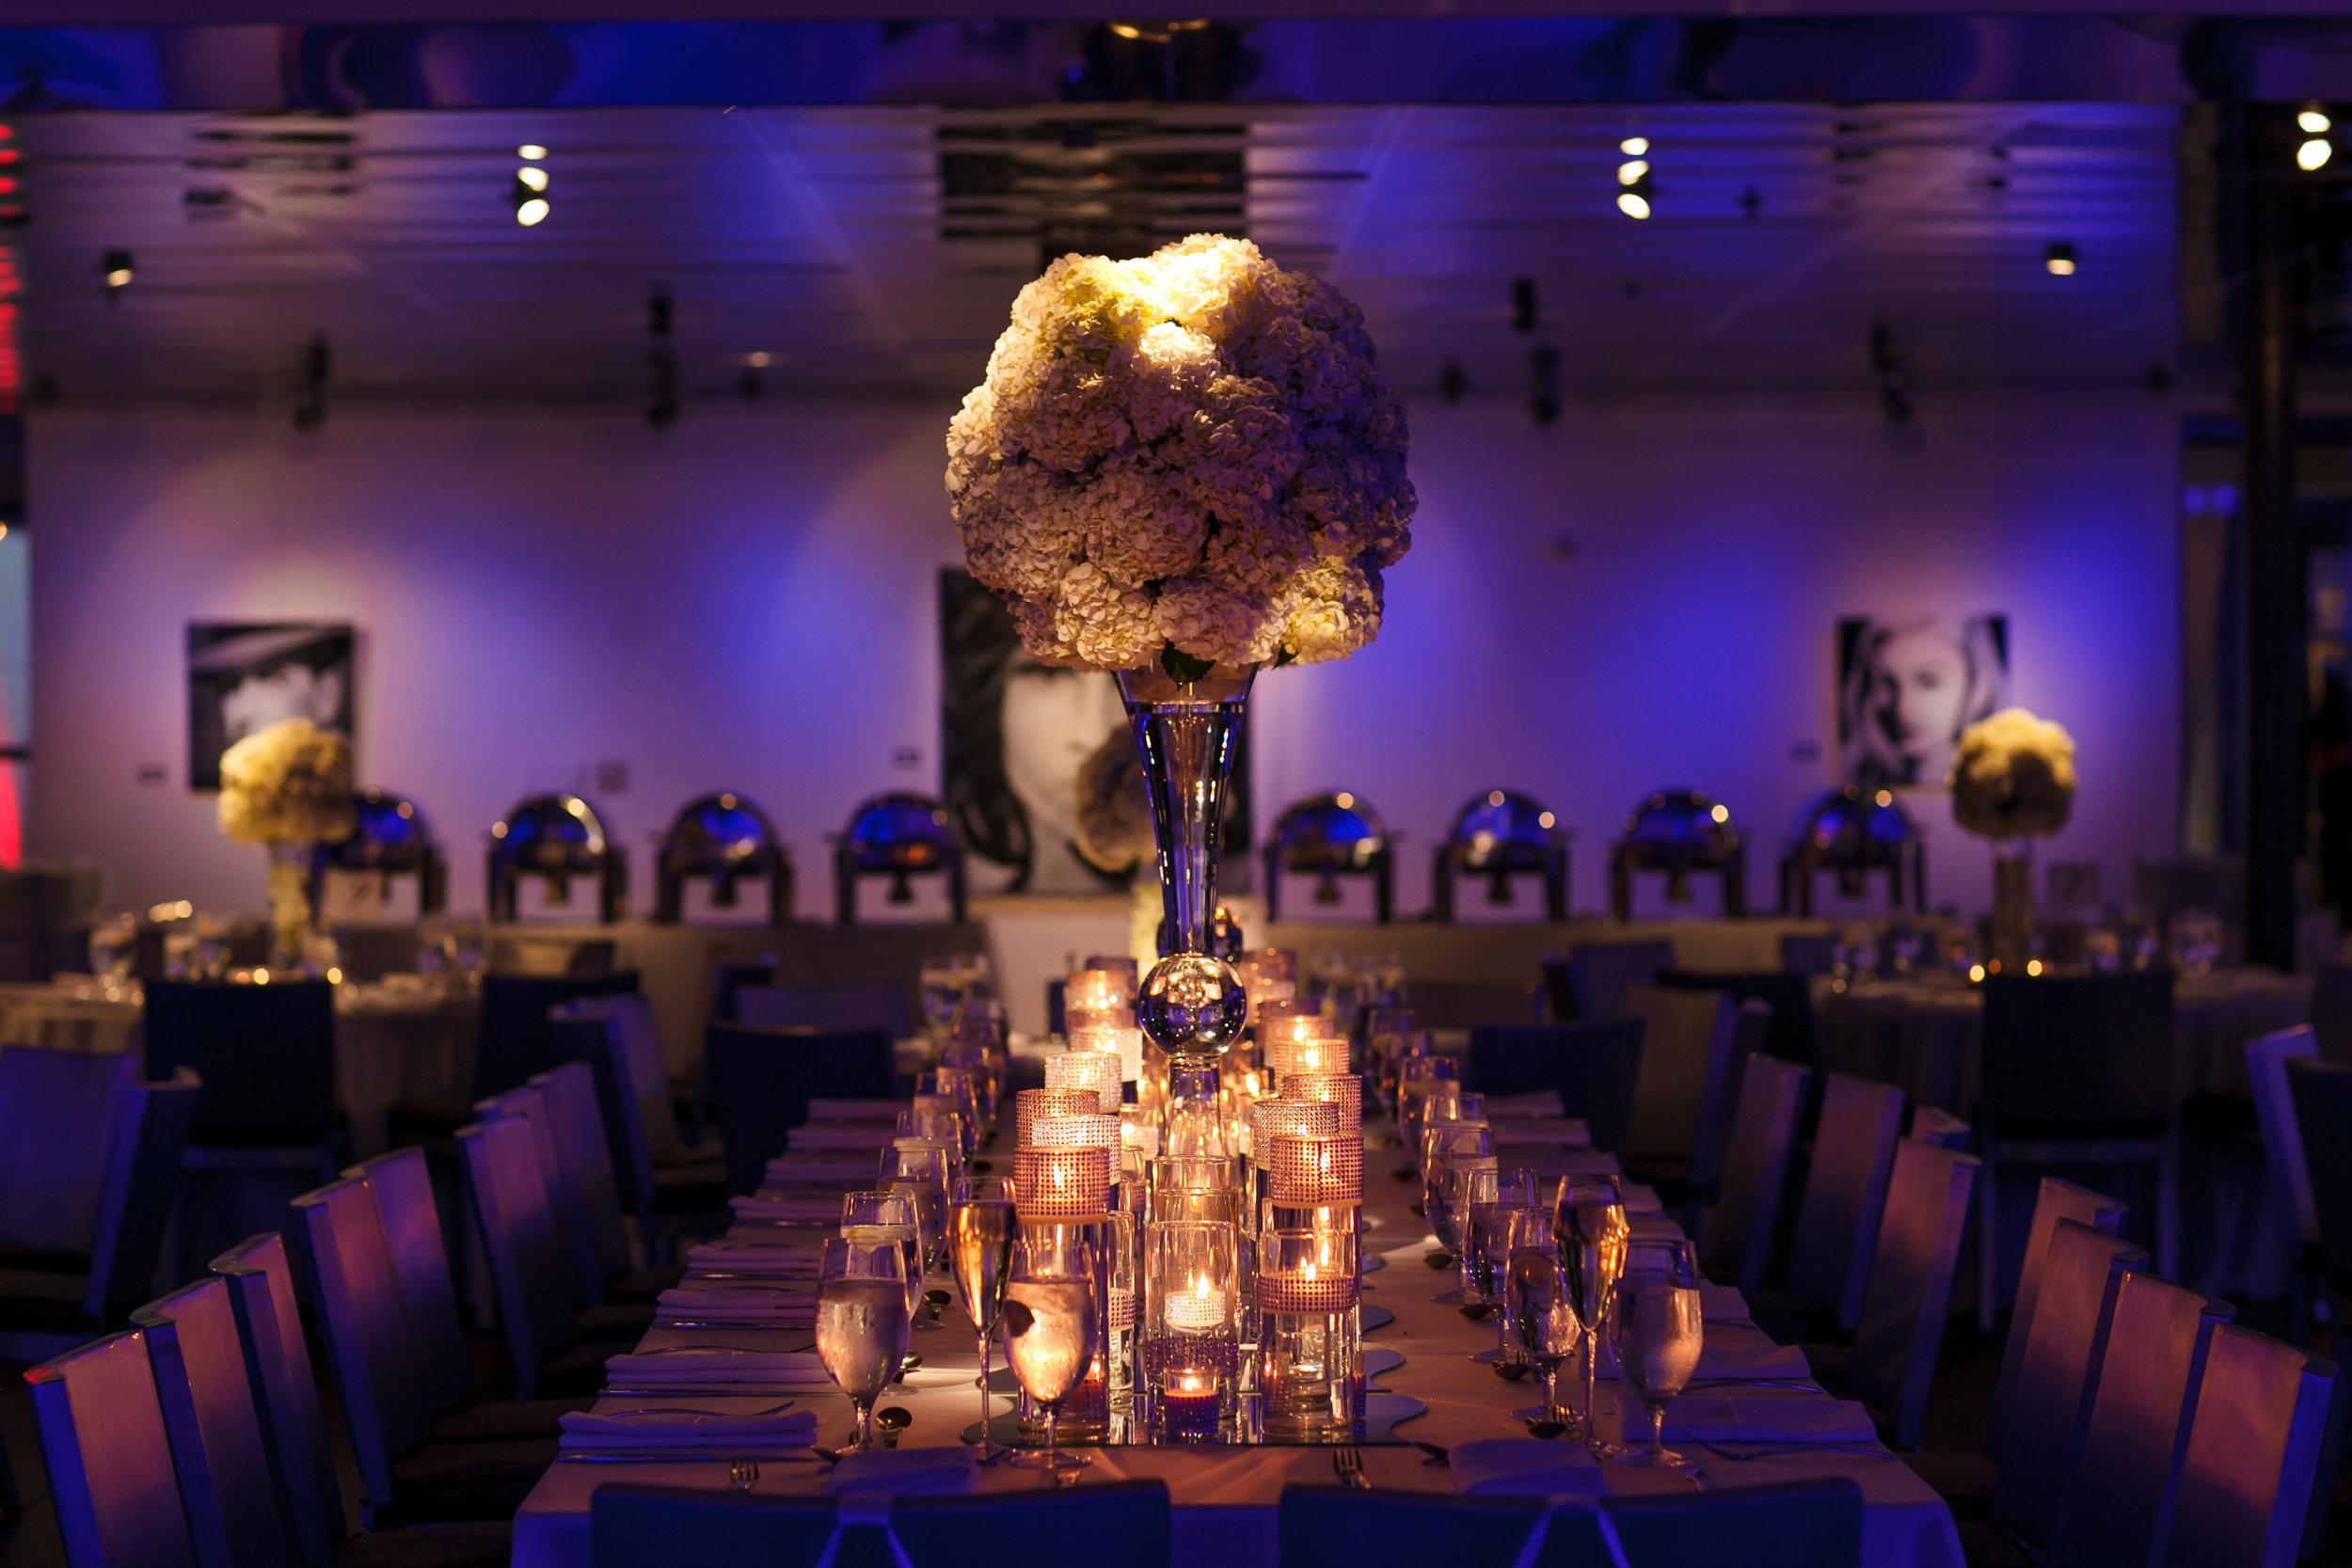 WEDDING RECEPTION AT SEVEN DEGREES IN LAGUNA BEACH, CALIFORNIA